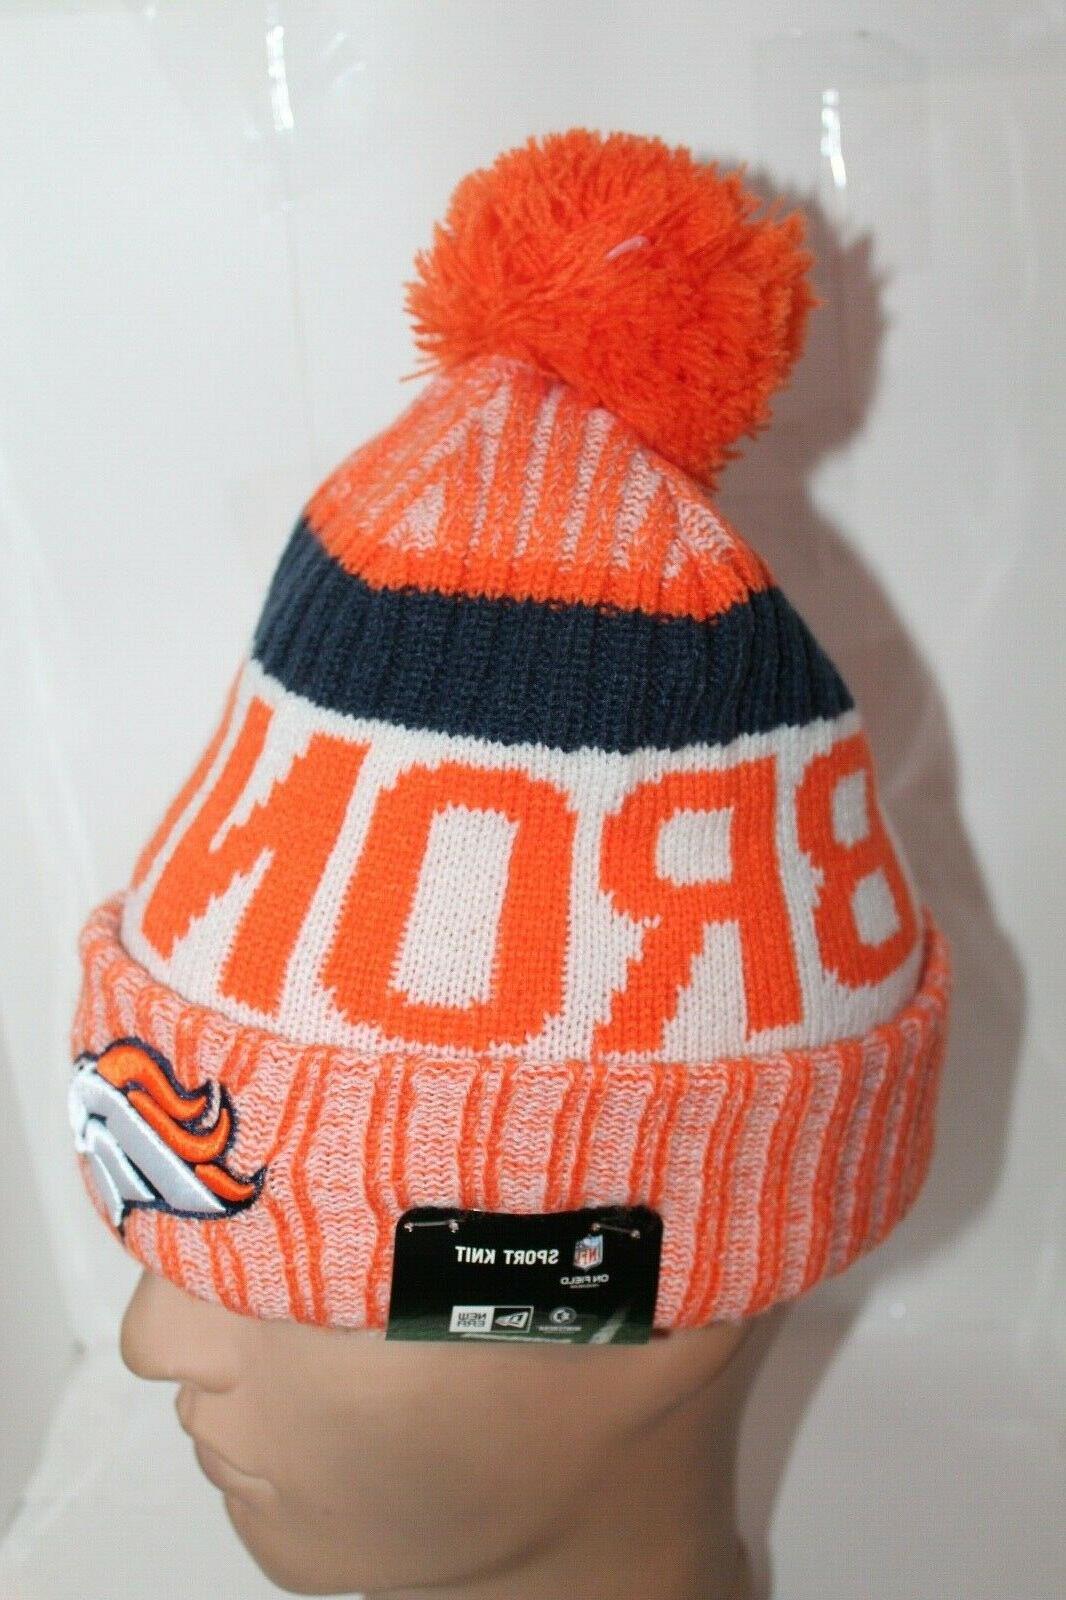 Denver Broncos NFL New Pom Winter Hat $ 30 NEW